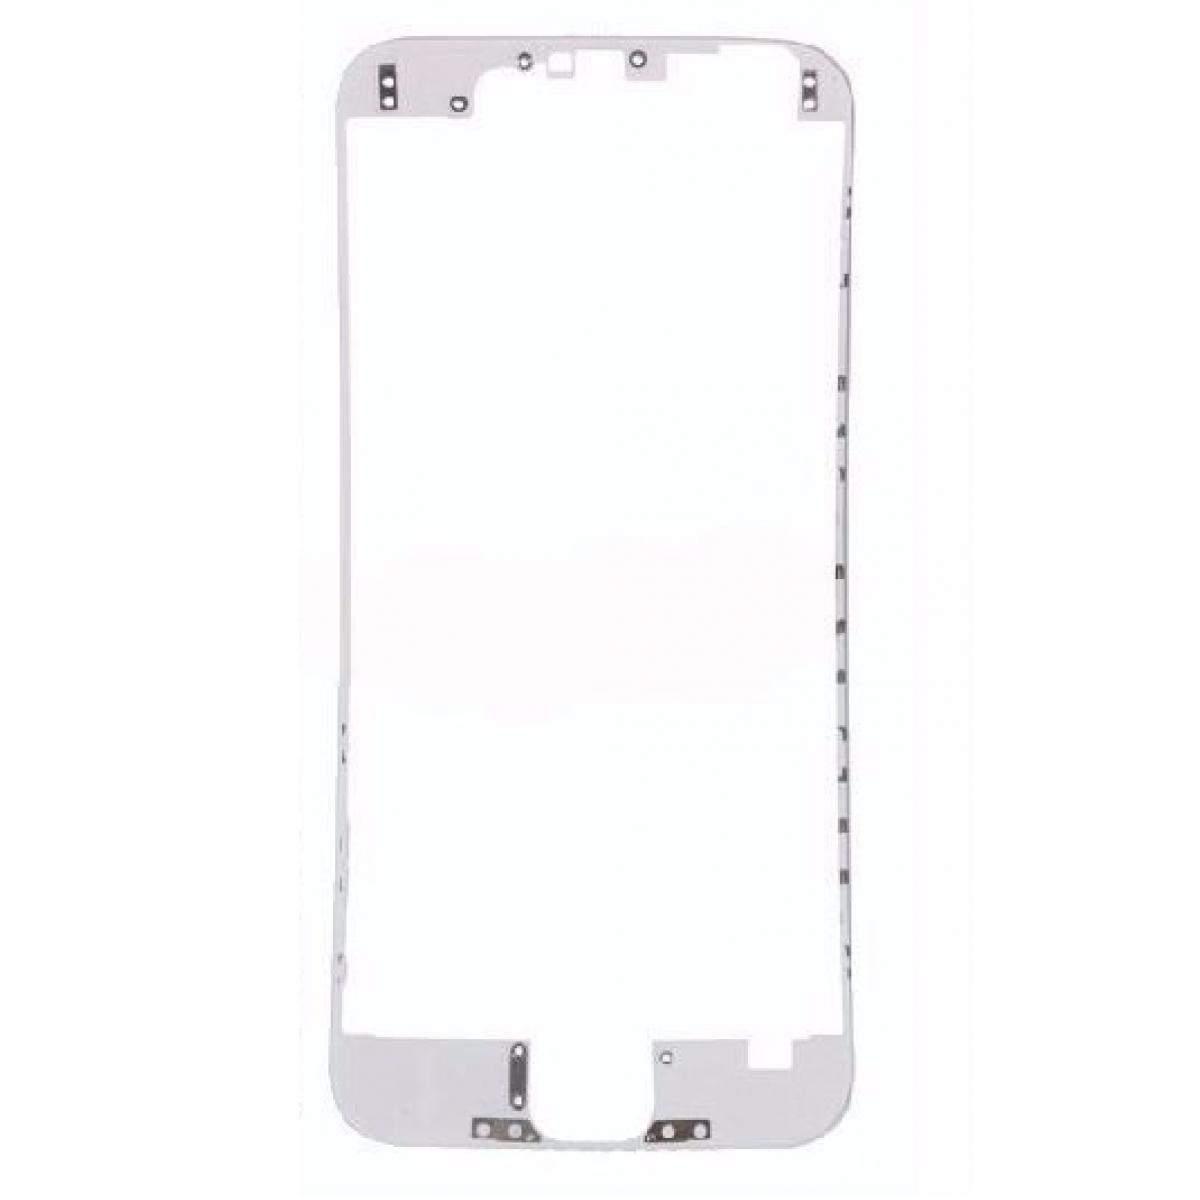 7cf7aafbf8a Repuesto reemplazo de Bisel Marco Frontal Chasis Medio para Iphone 6 Plus  Blanco